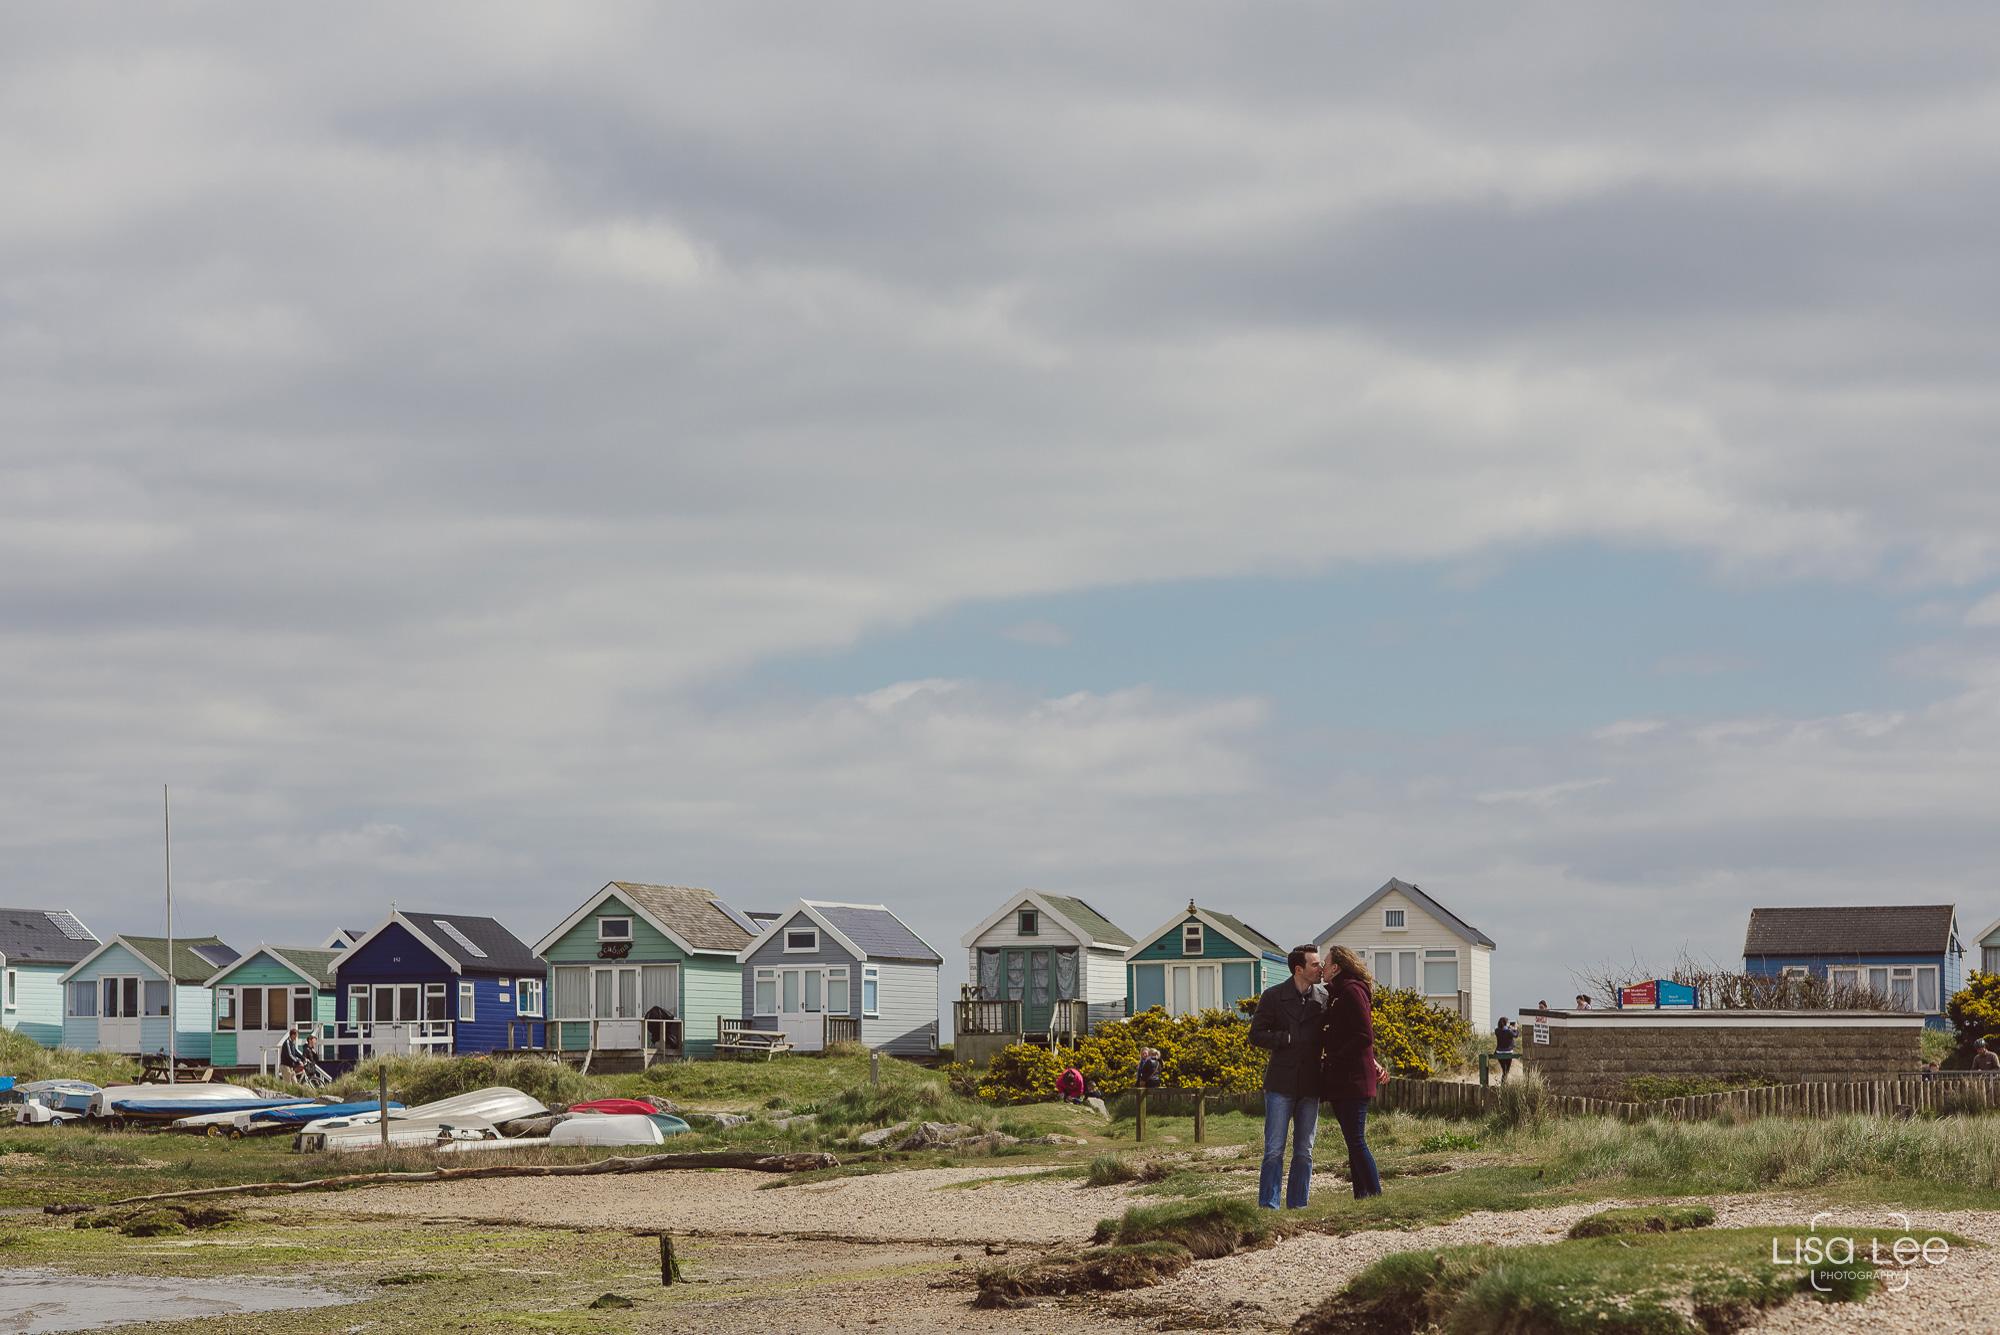 creative-documentary-wedding-photography-beach-huts-dorset--2.jpg